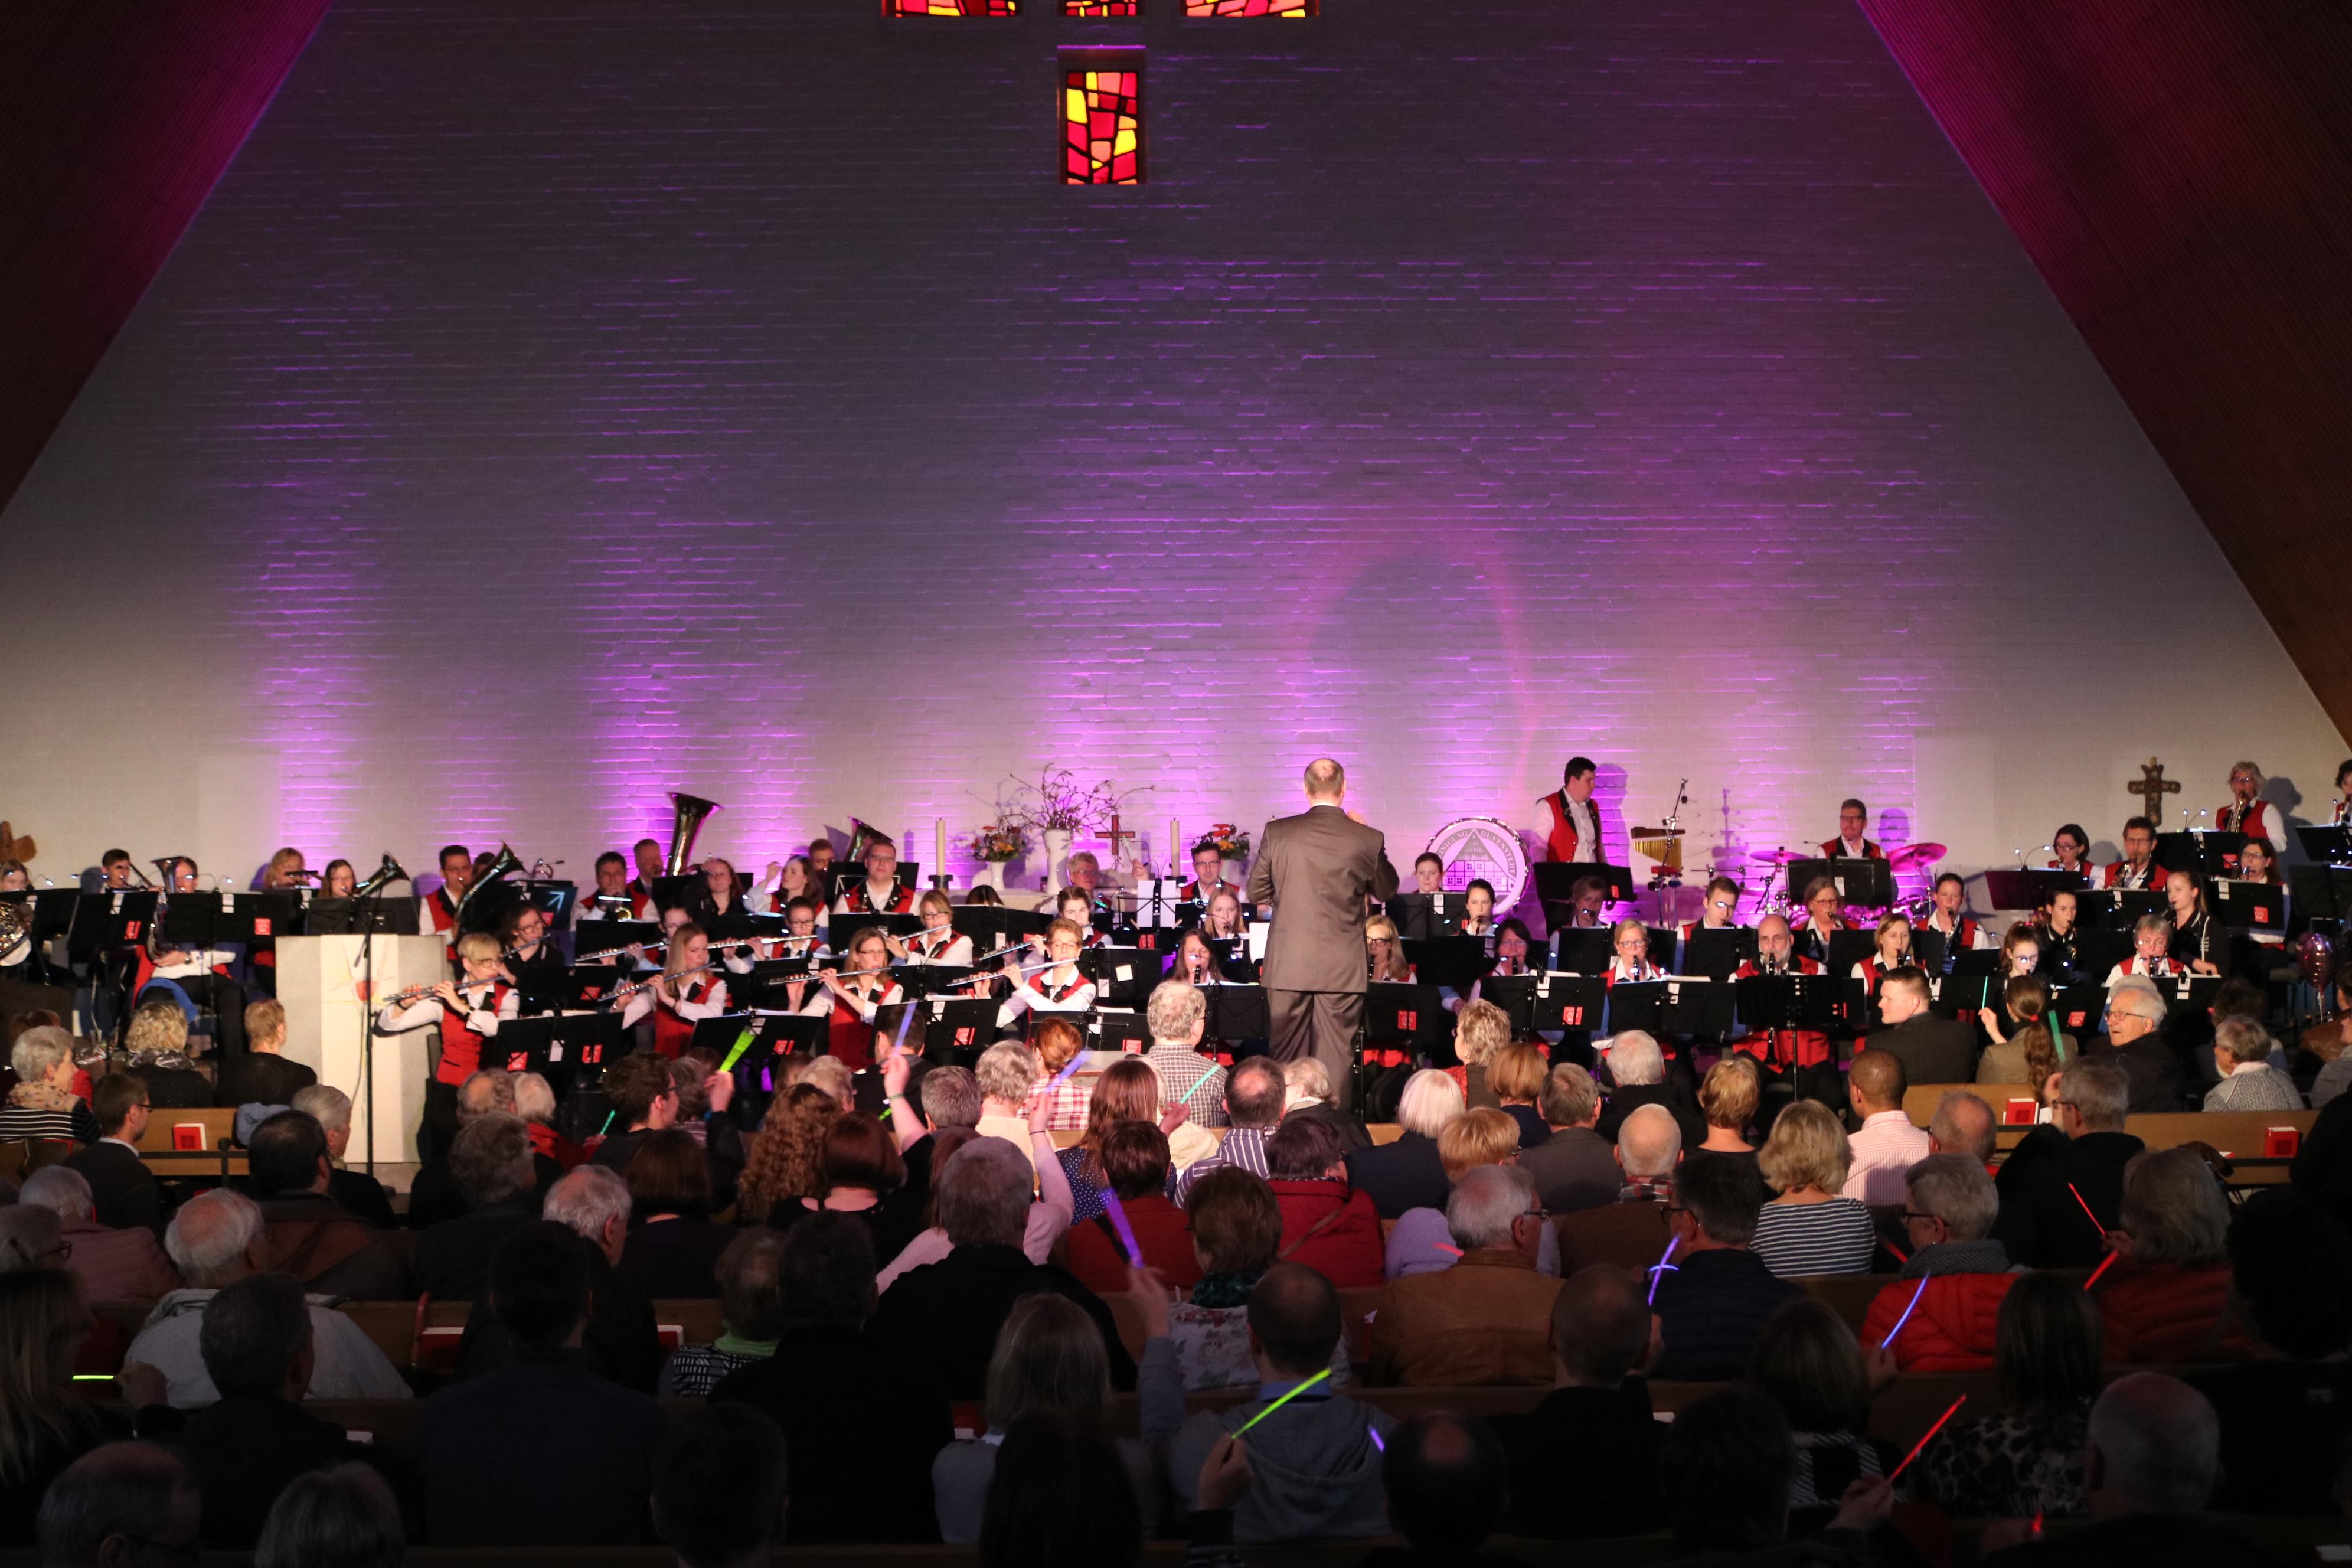 Orchester Duvenstedt